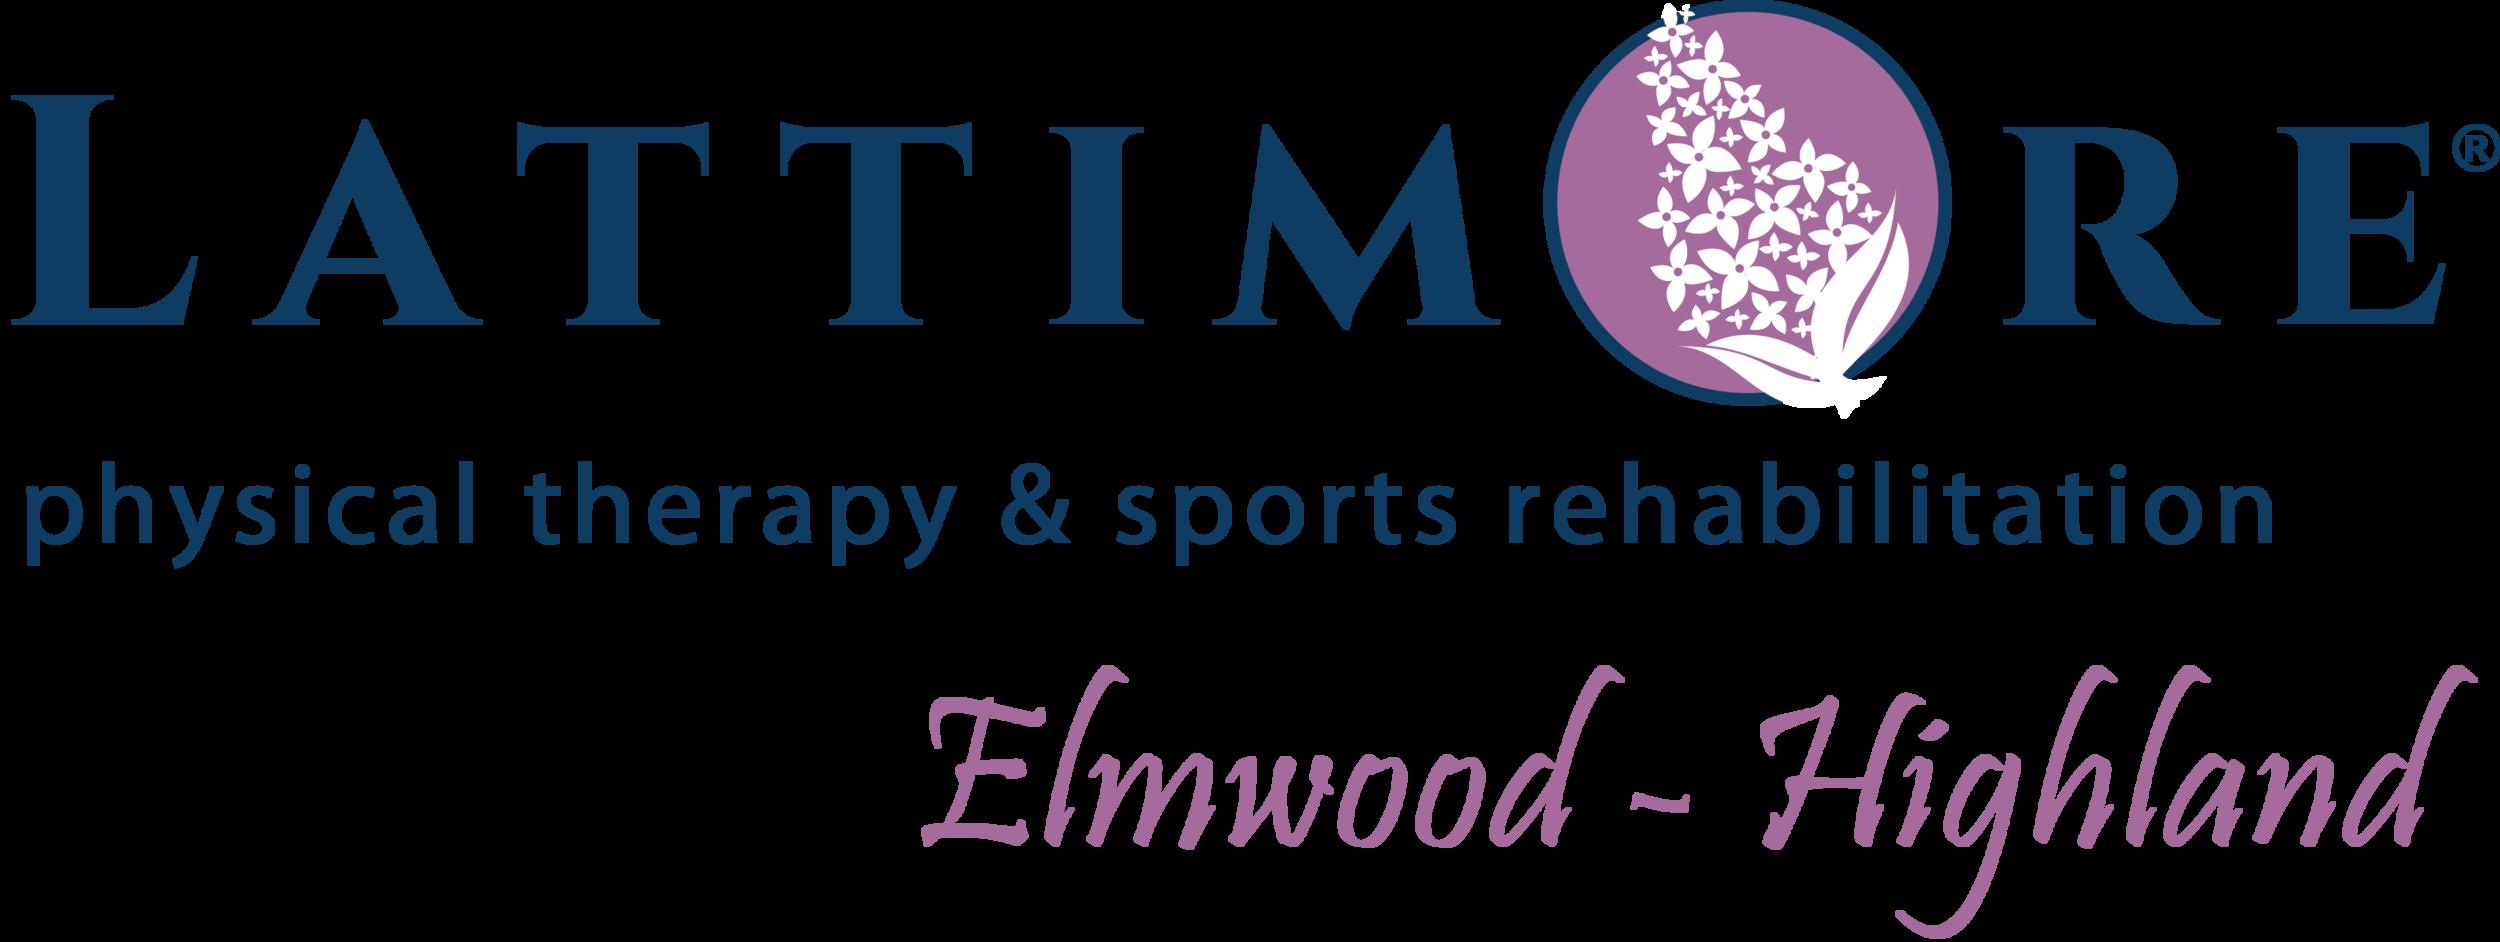 2019-05_Lattimore-Logo-Elmwood-Highland.png